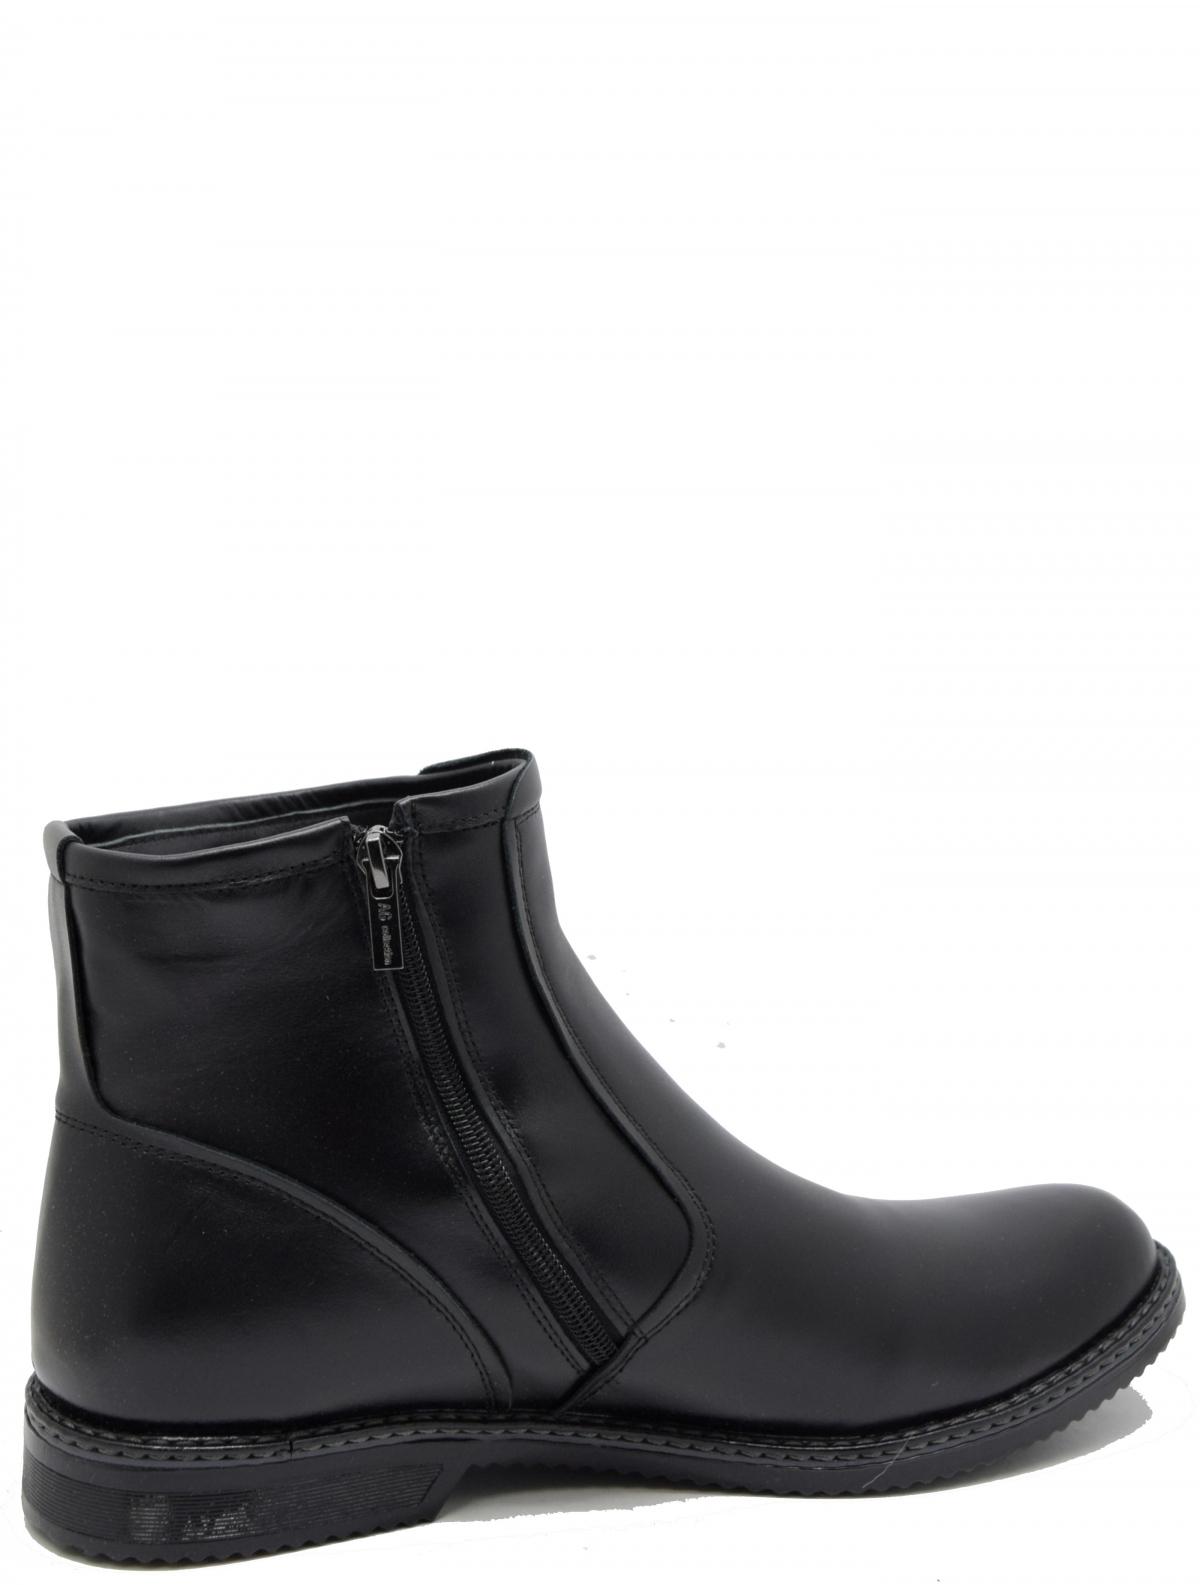 AG 1502-1/1 мужские ботинки